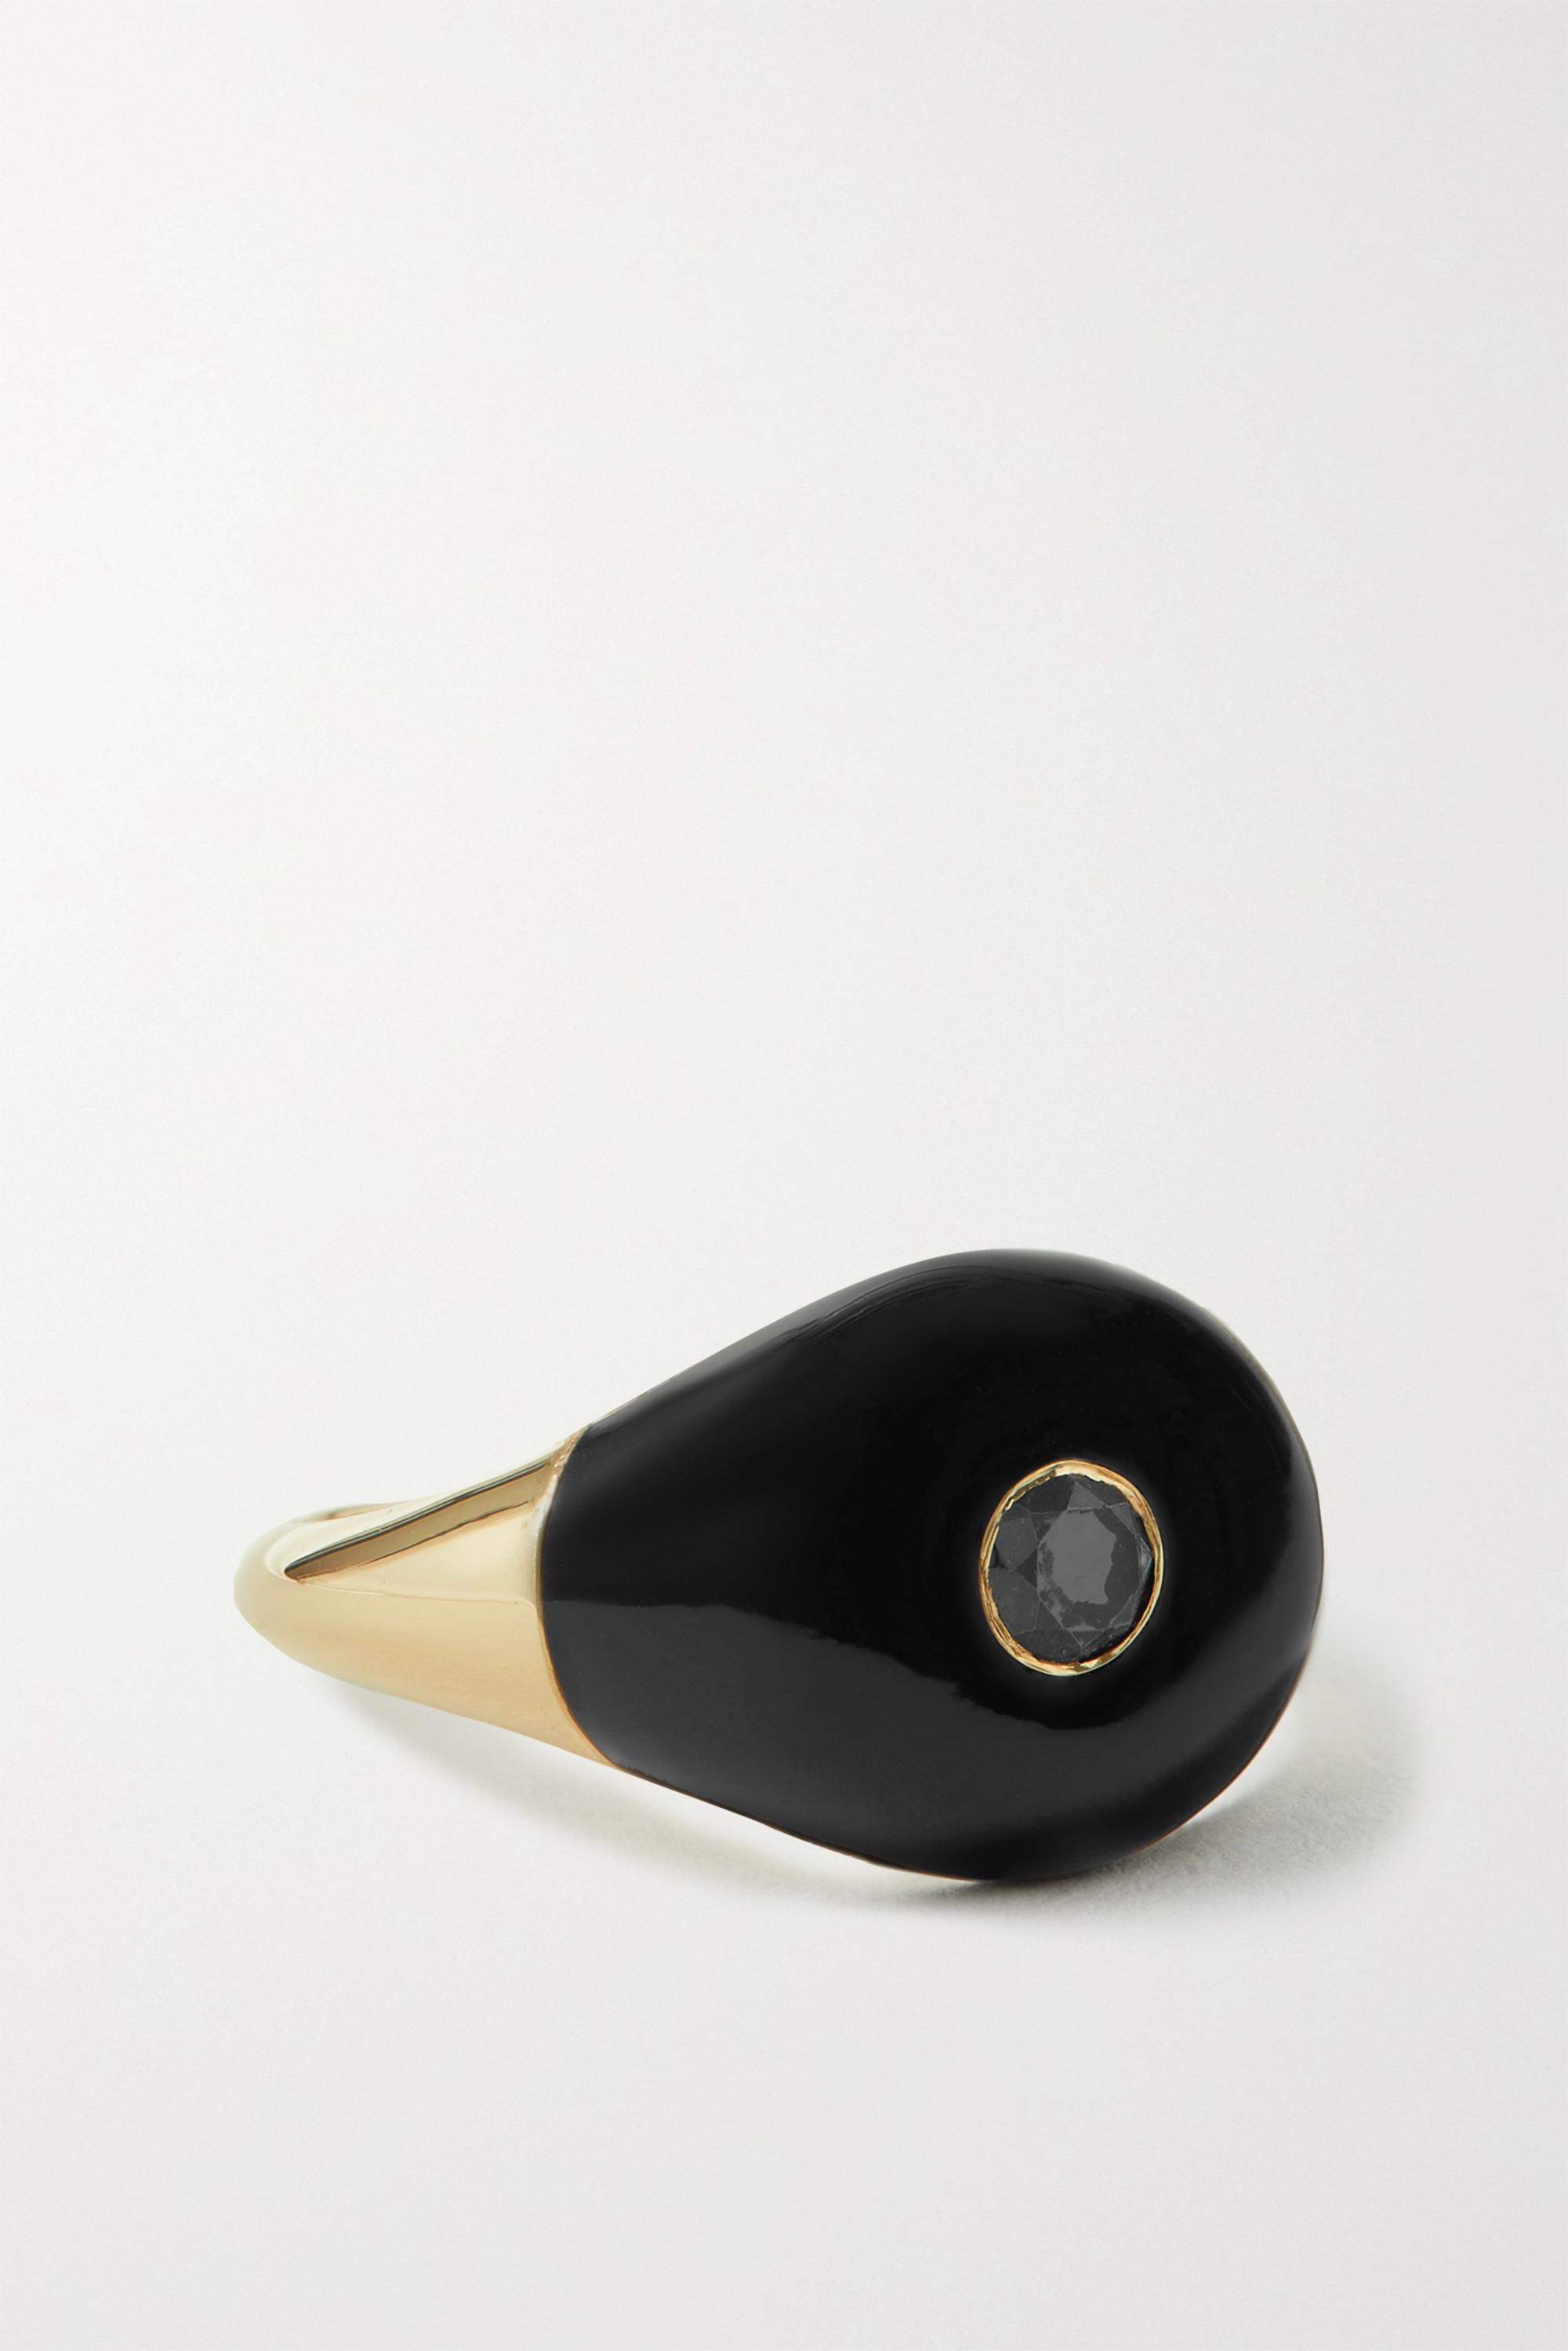 Charms Company Les Bonbons Ring aus 14 Karat Gold mit Emaille und Diamant